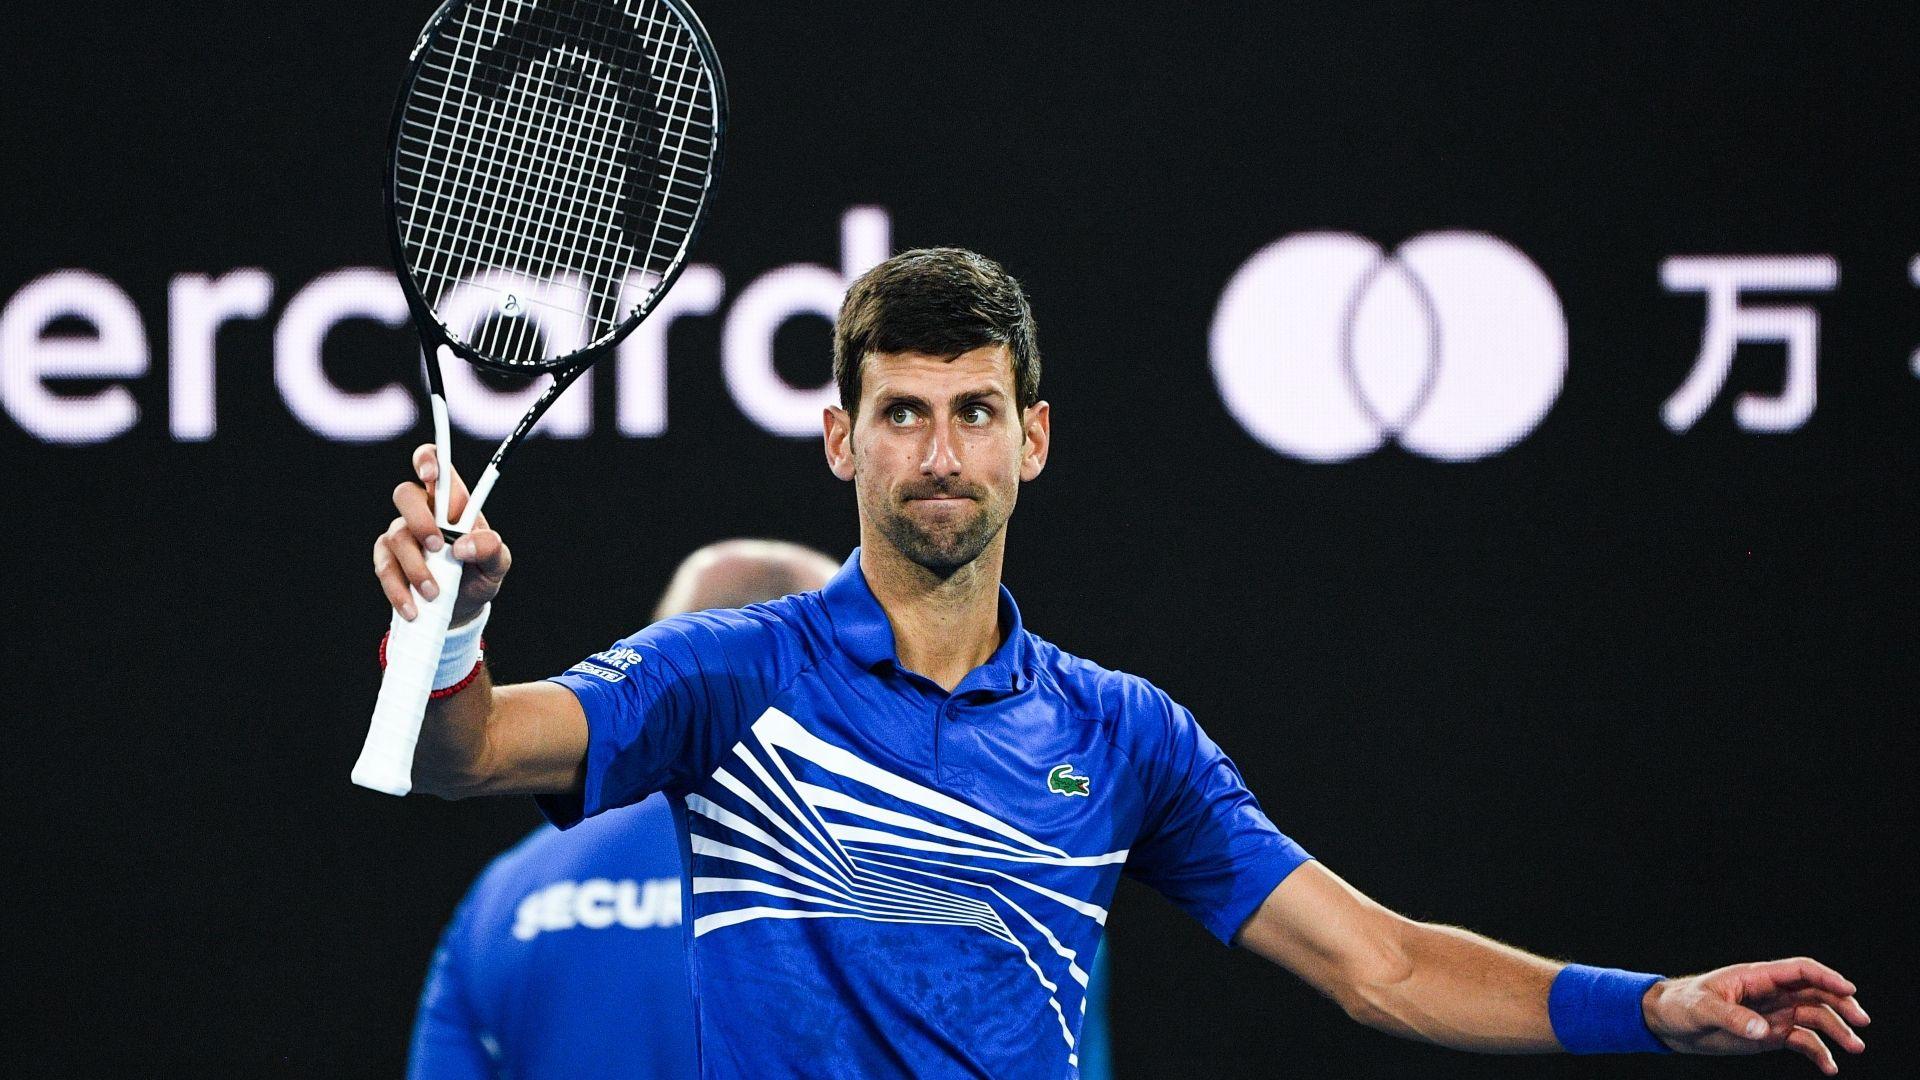 Djokovic advances after Nishikori retires with injury